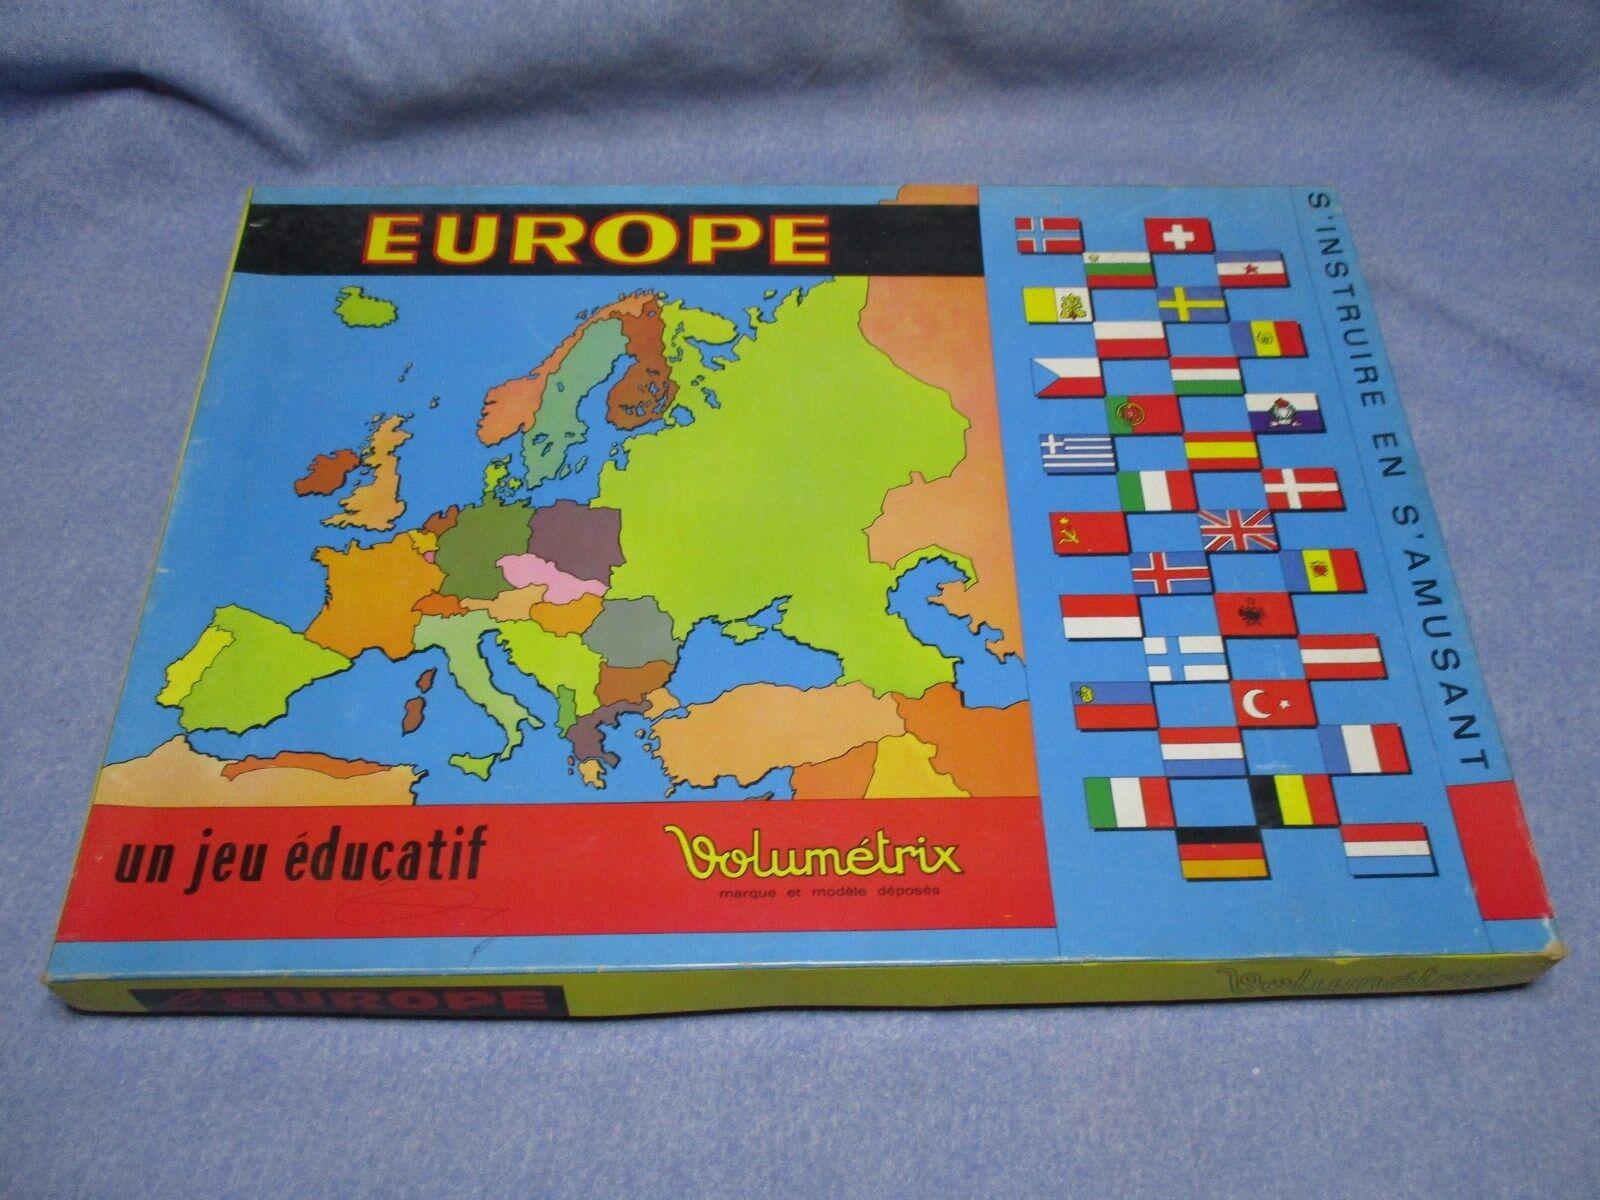 AE808 VOLUMETRIX EUROPE PUZZLE JEU EDUCATIF SUPERBE ETAT